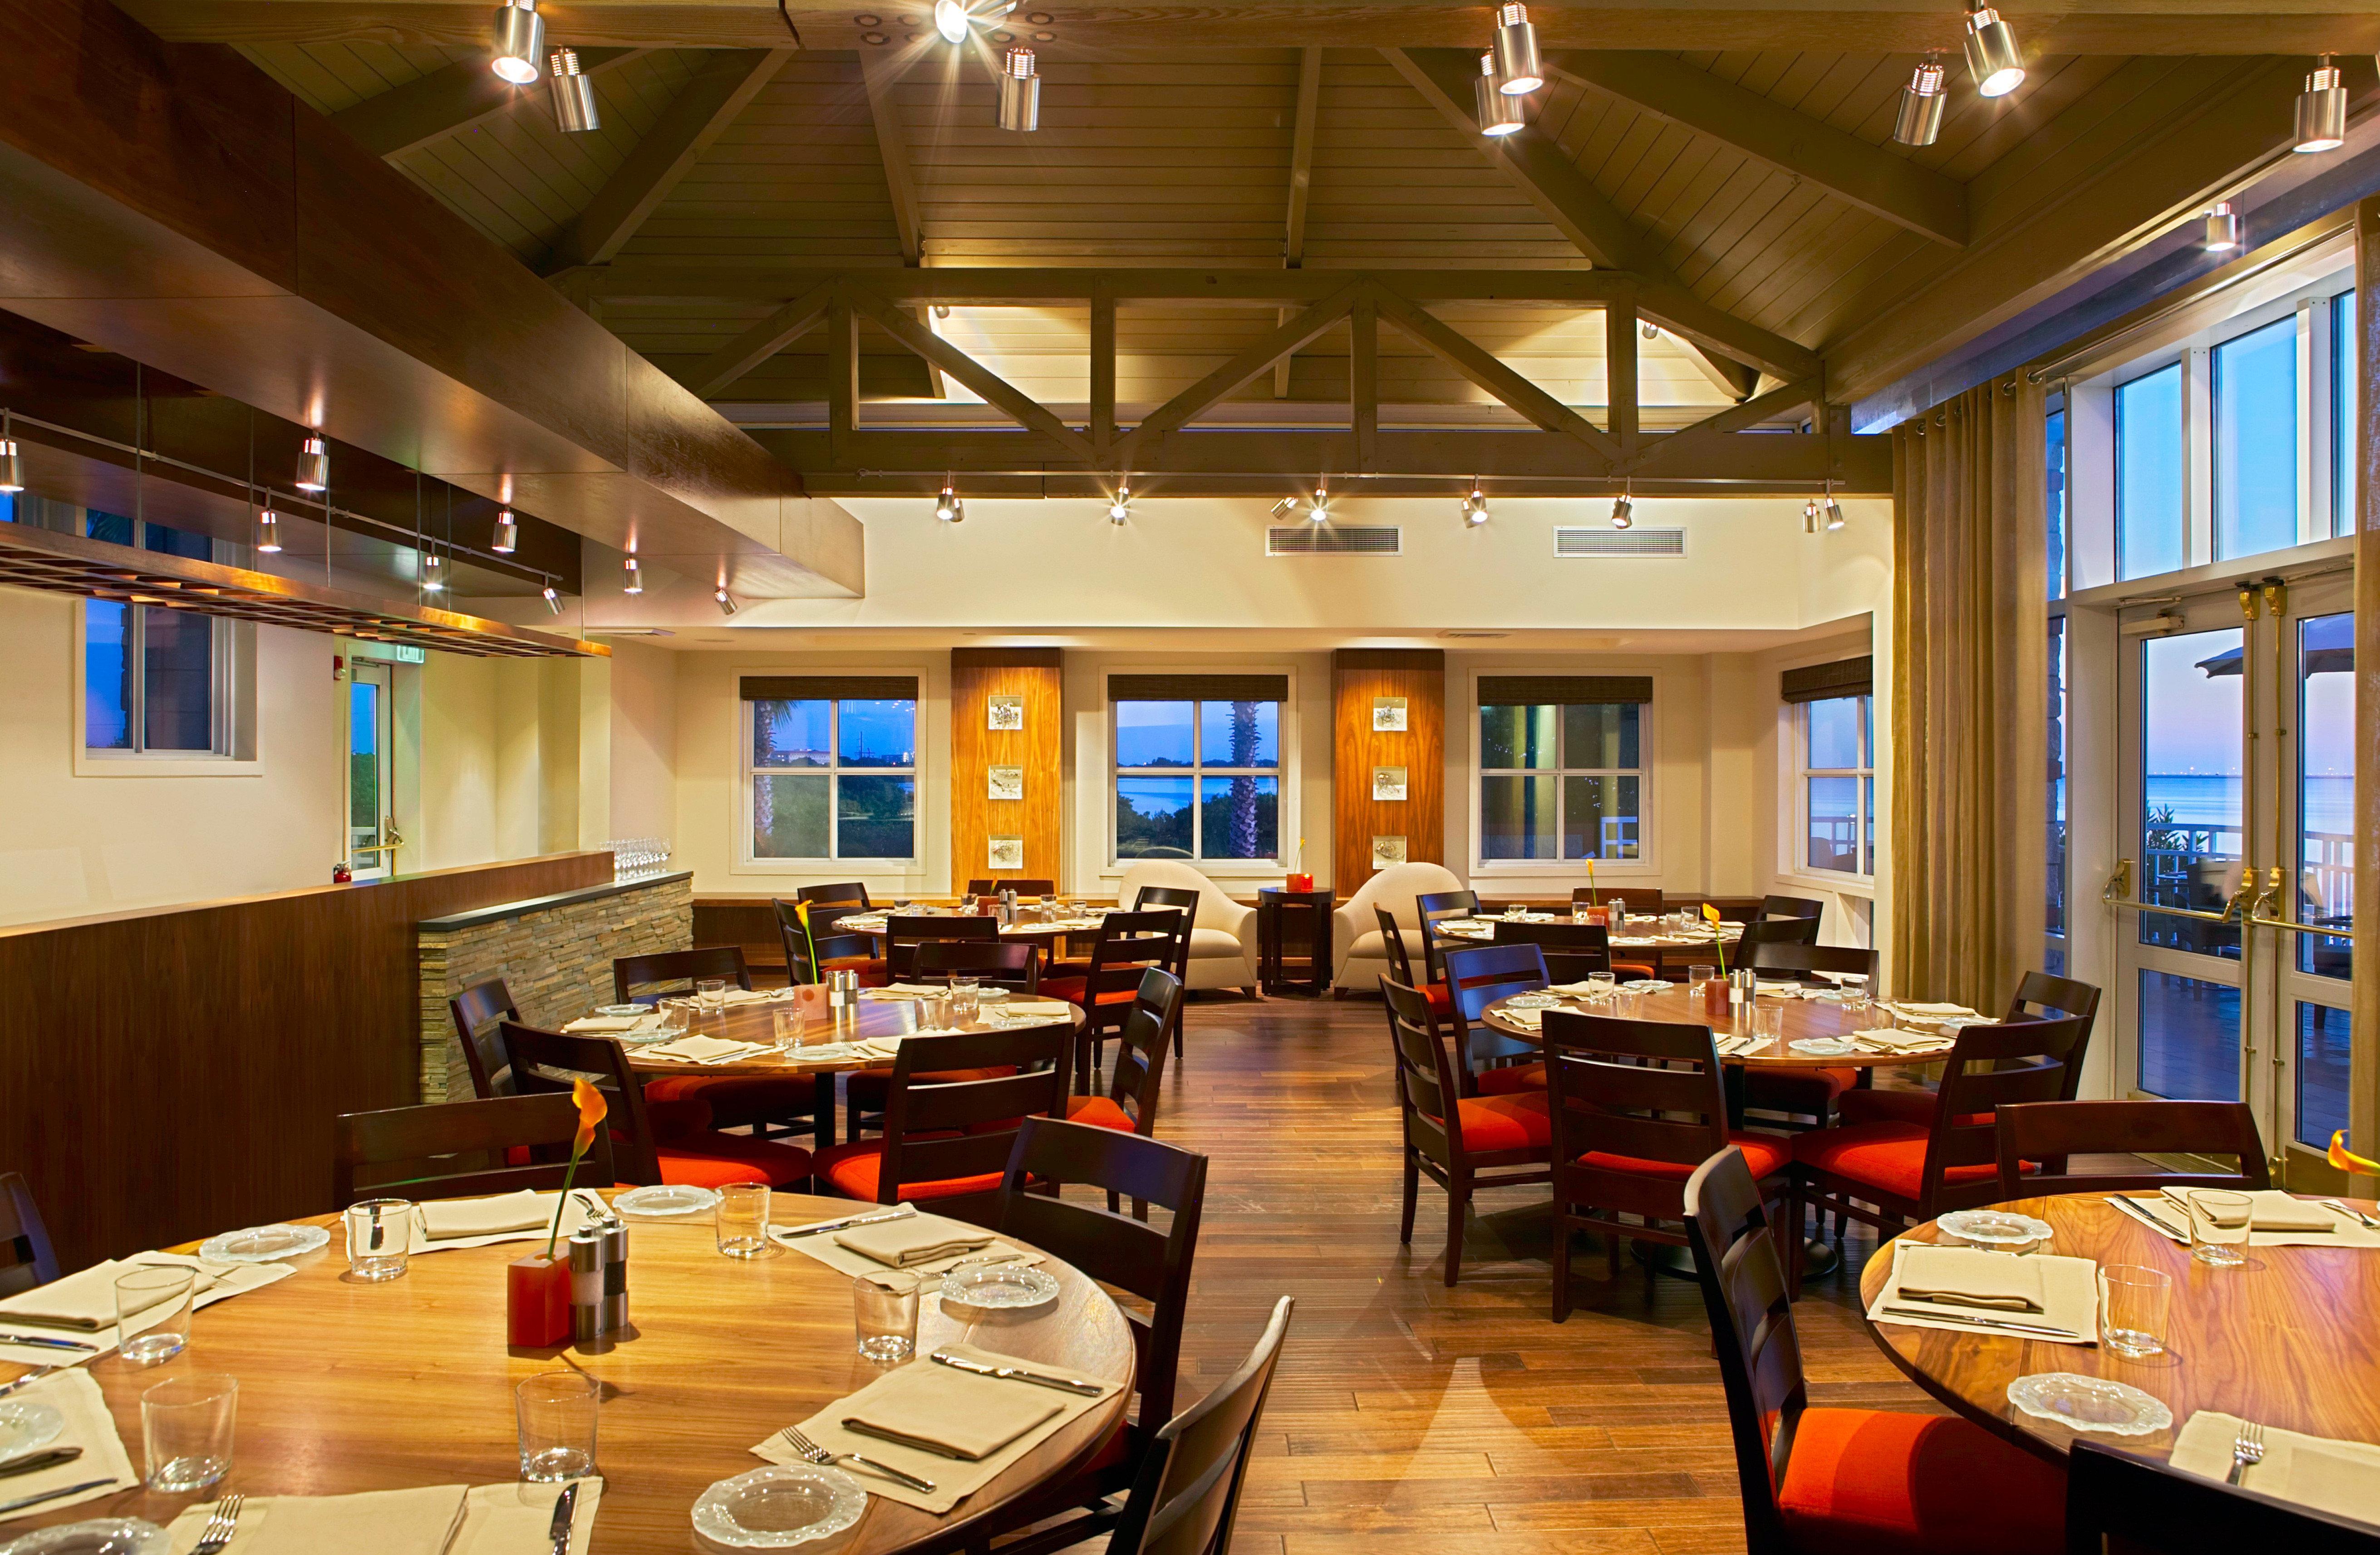 Bar Dining Drink Eat Elegant recreation room building billiard room conference hall restaurant library